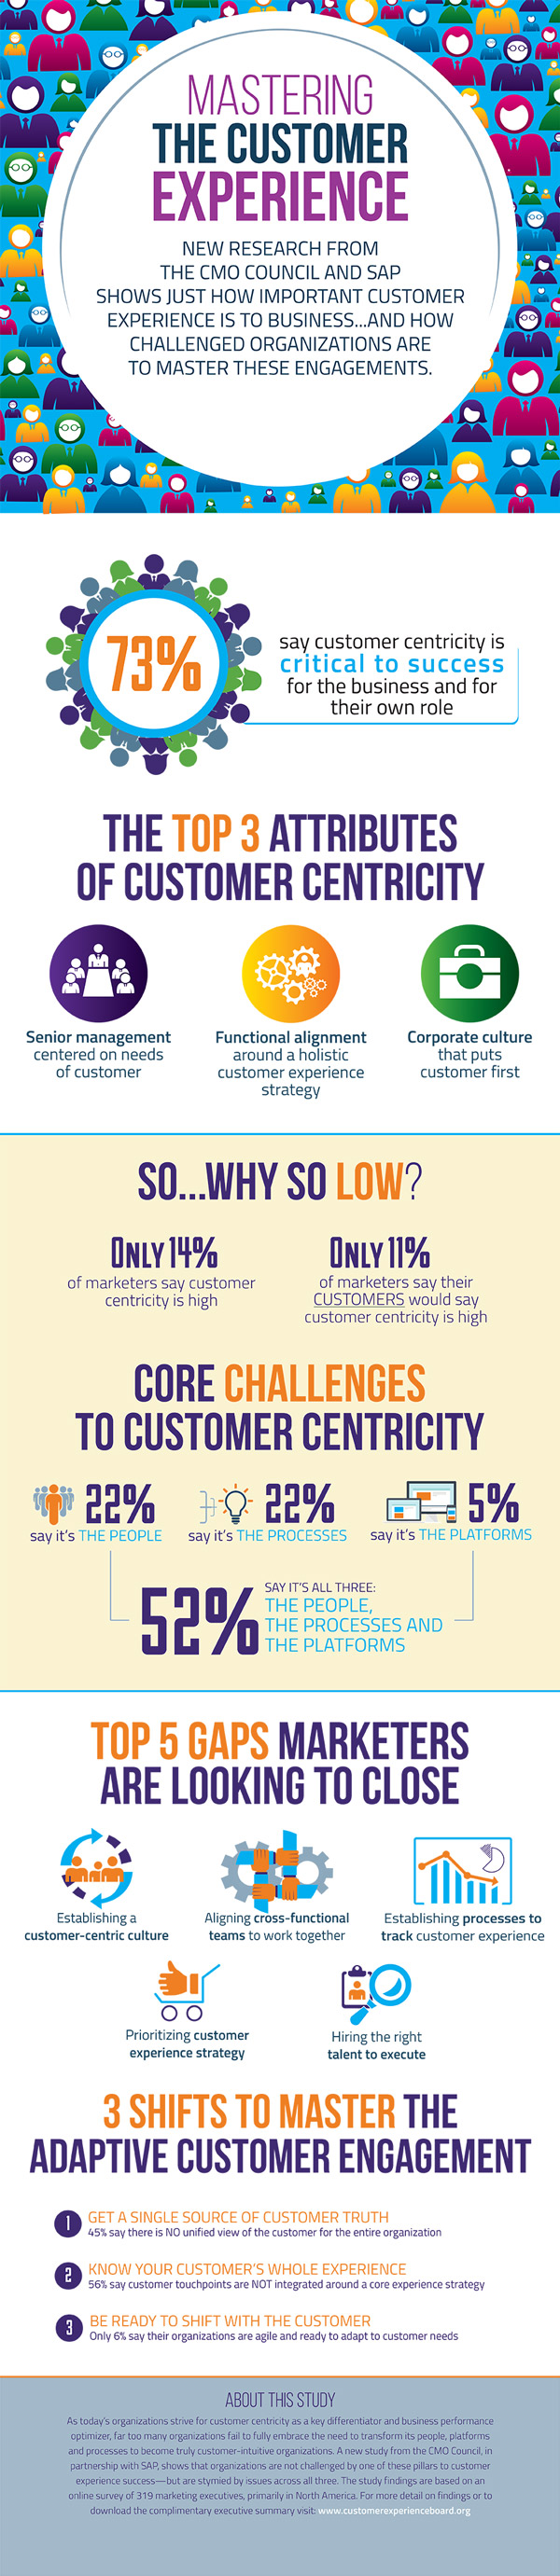 Mastering-Adaptive-Customer-Engagements_Infographic_600